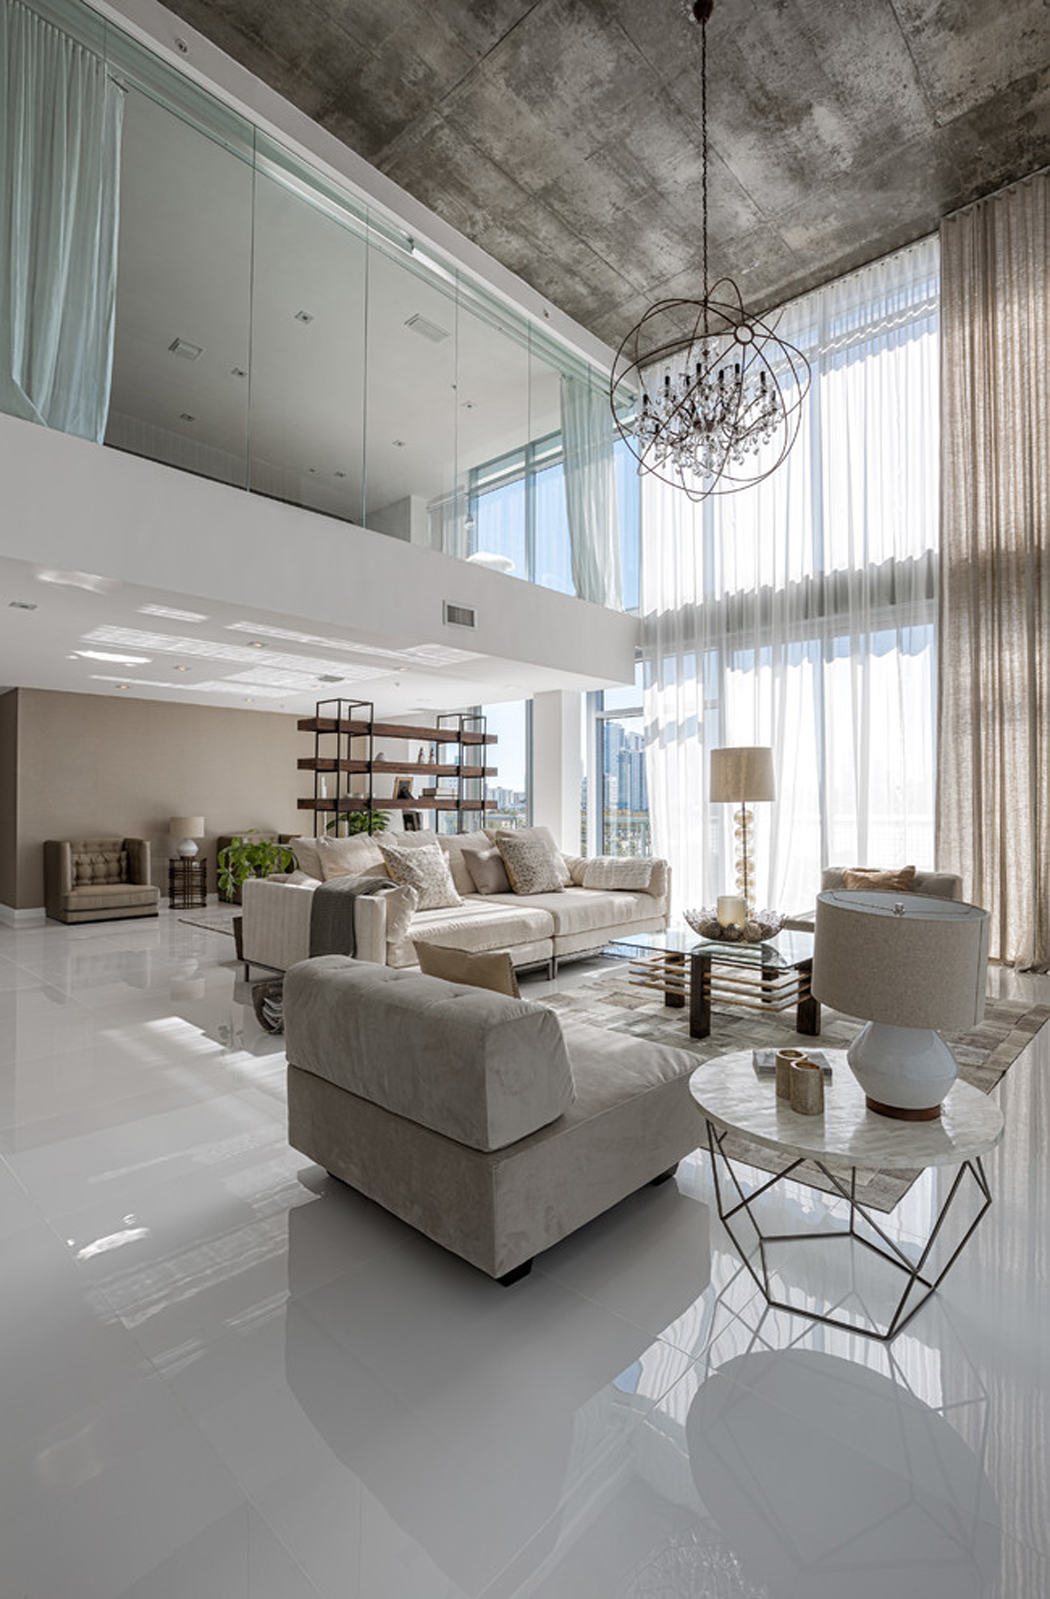 bel appartement en duplex au design moderne situ miami vivons